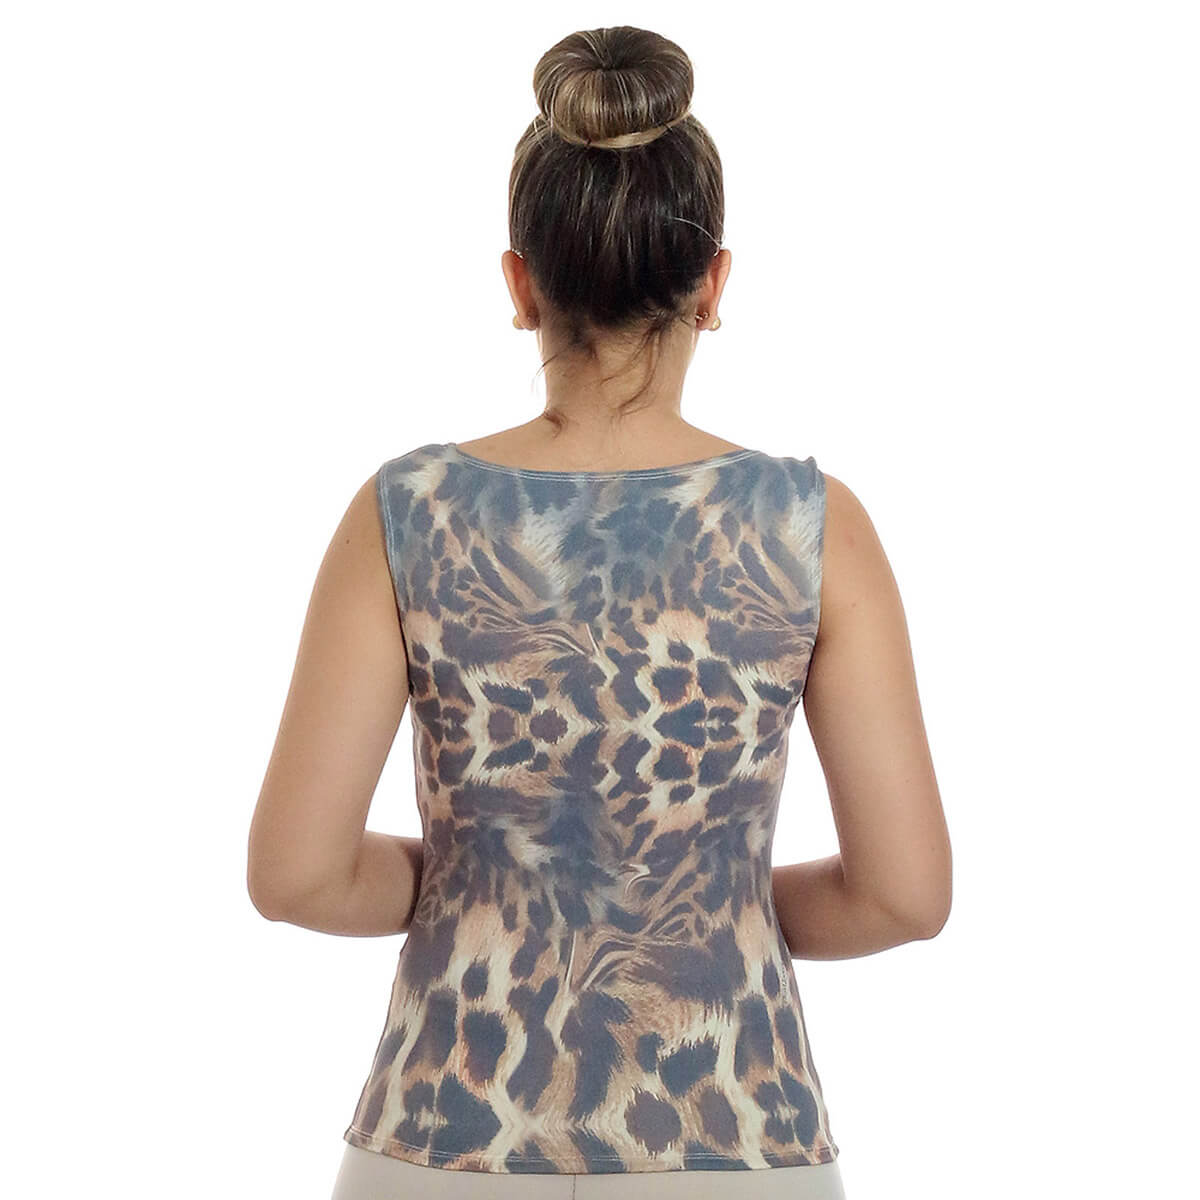 Regata Feminina Estampa Exclusiva Animal Print Onça Decote Canoa